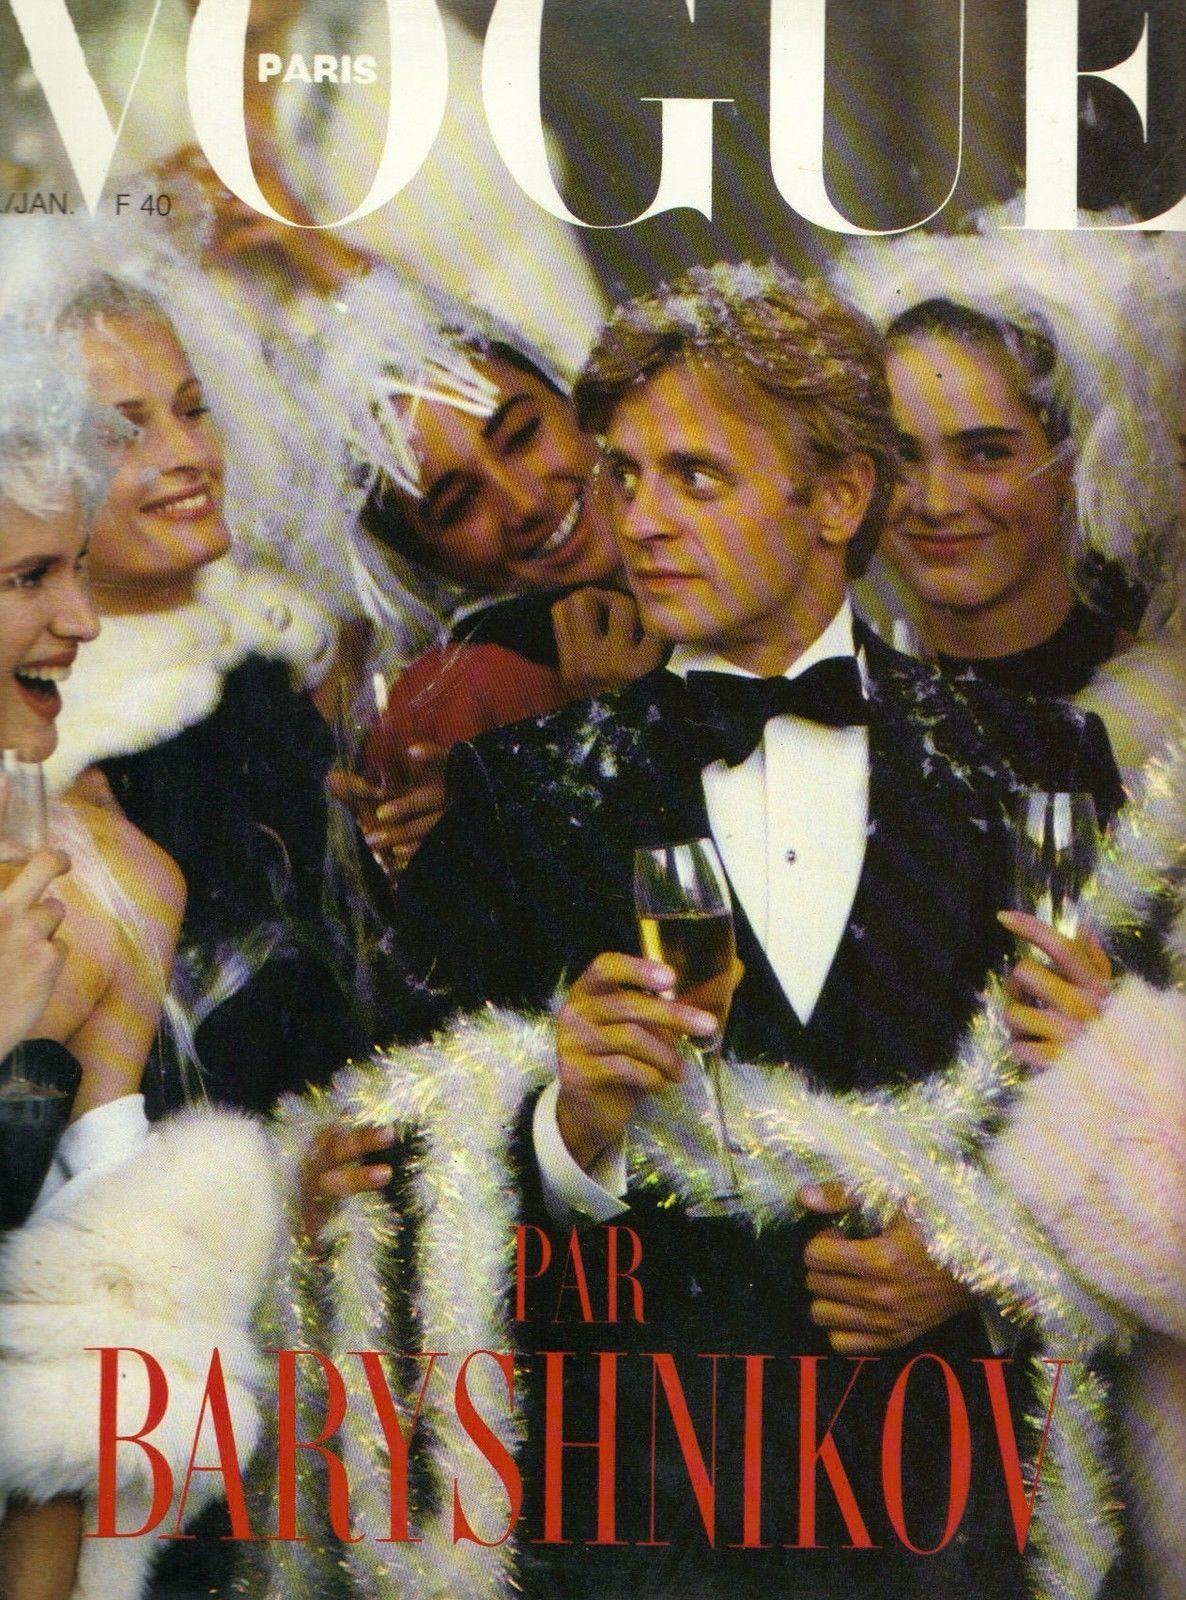 PARIS VOGUE - JANUARY 1986 COVER MODEL : MIKHAIL BARYSHNIKOV